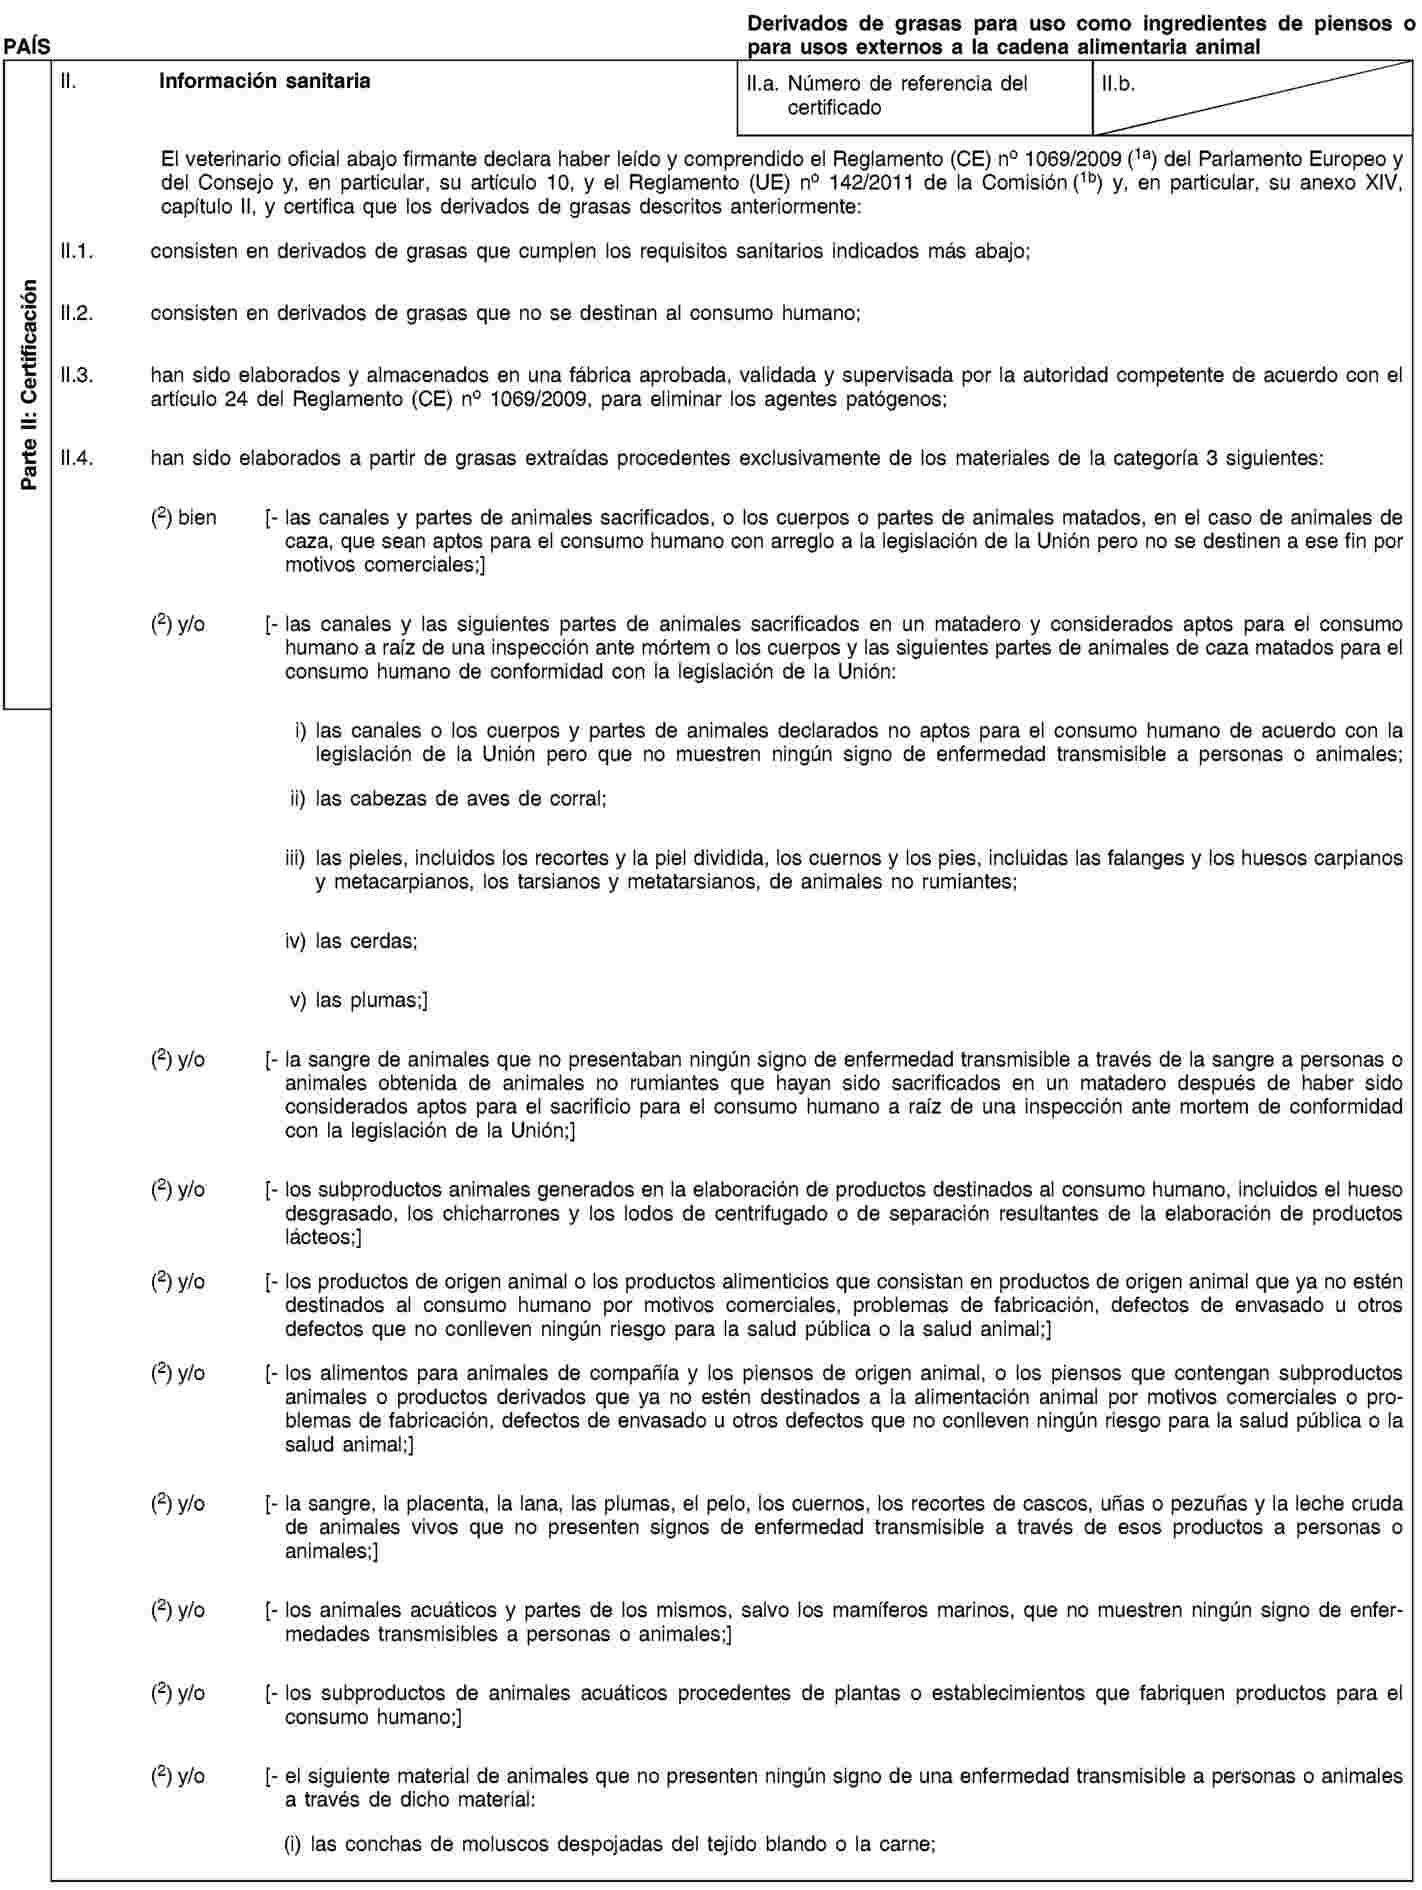 Imagen: https://eur-lex.europa.eu/resource.html?uri=uriserv:OJ.L_.2011.054.01.0001.01.SPA.xhtml.L_2011054ES.01023001.tif.jpg